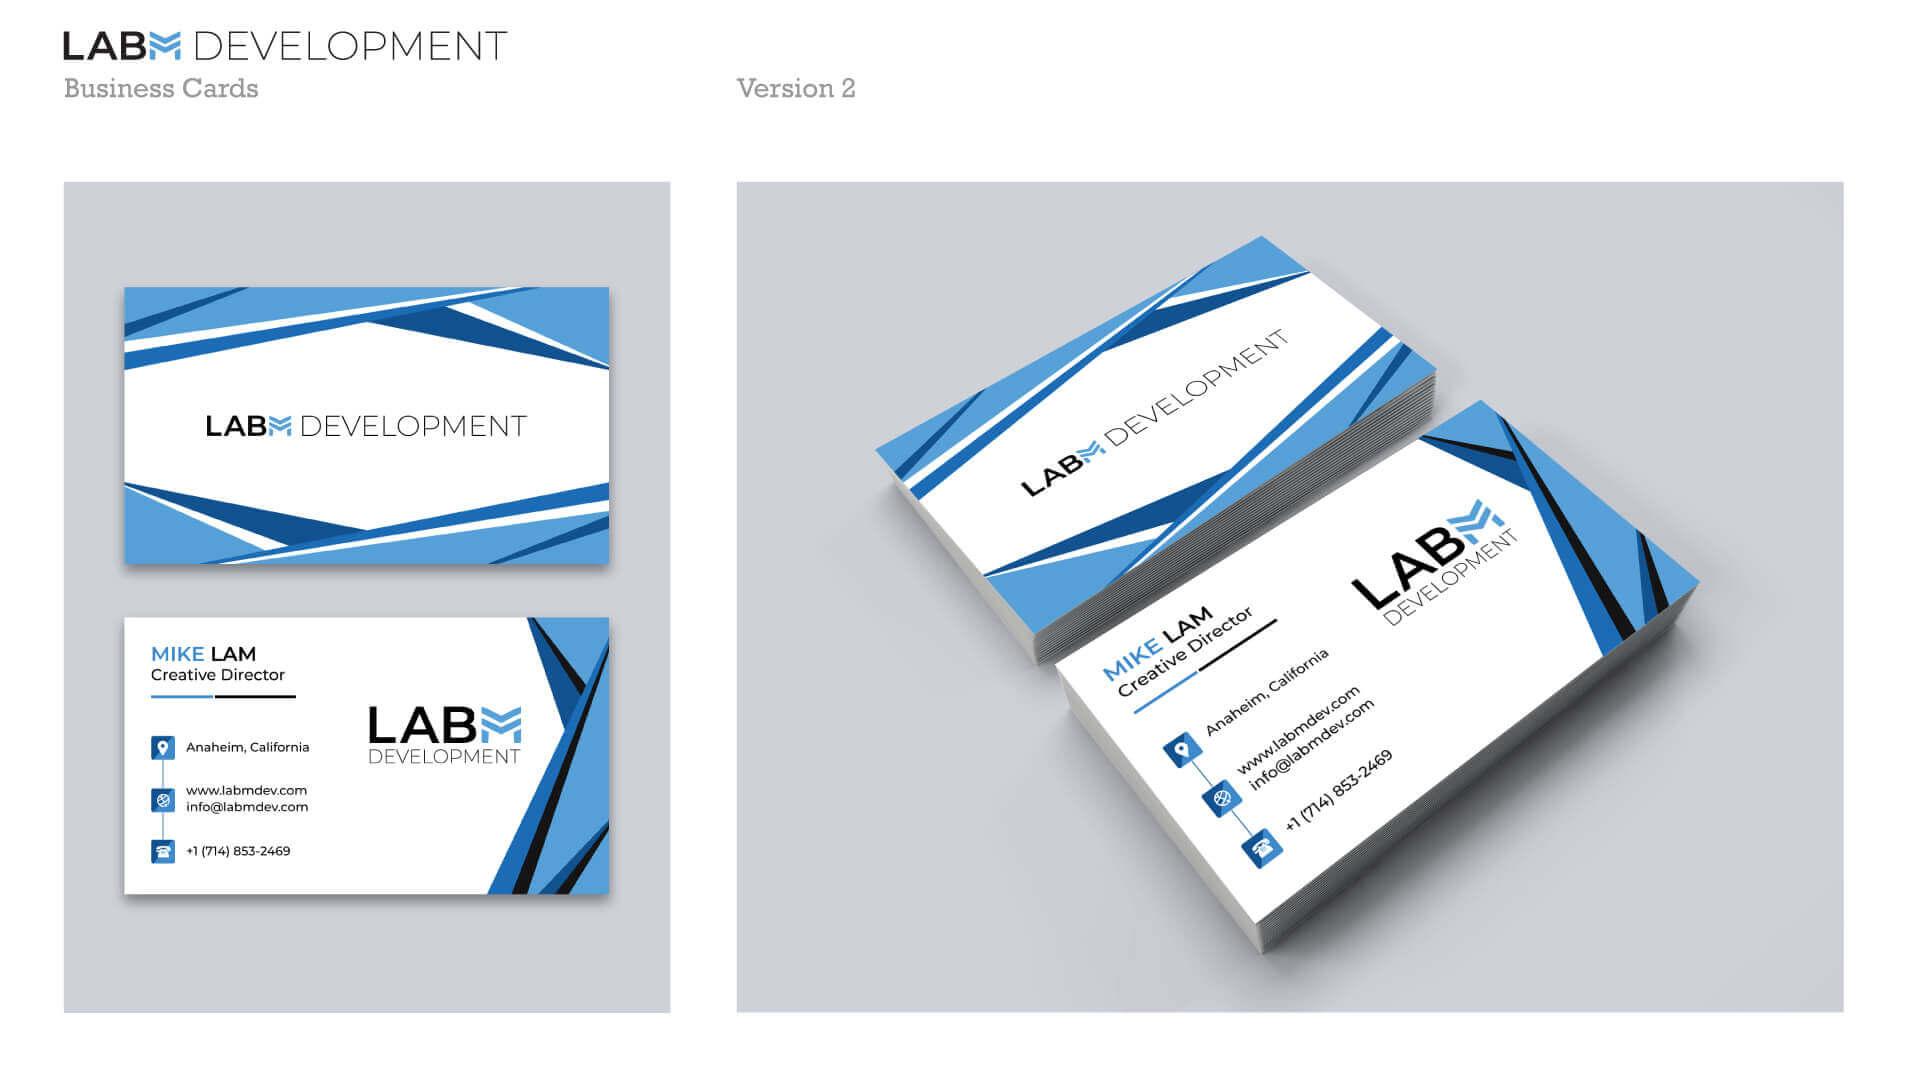 LabM-Business-Card-2jpg